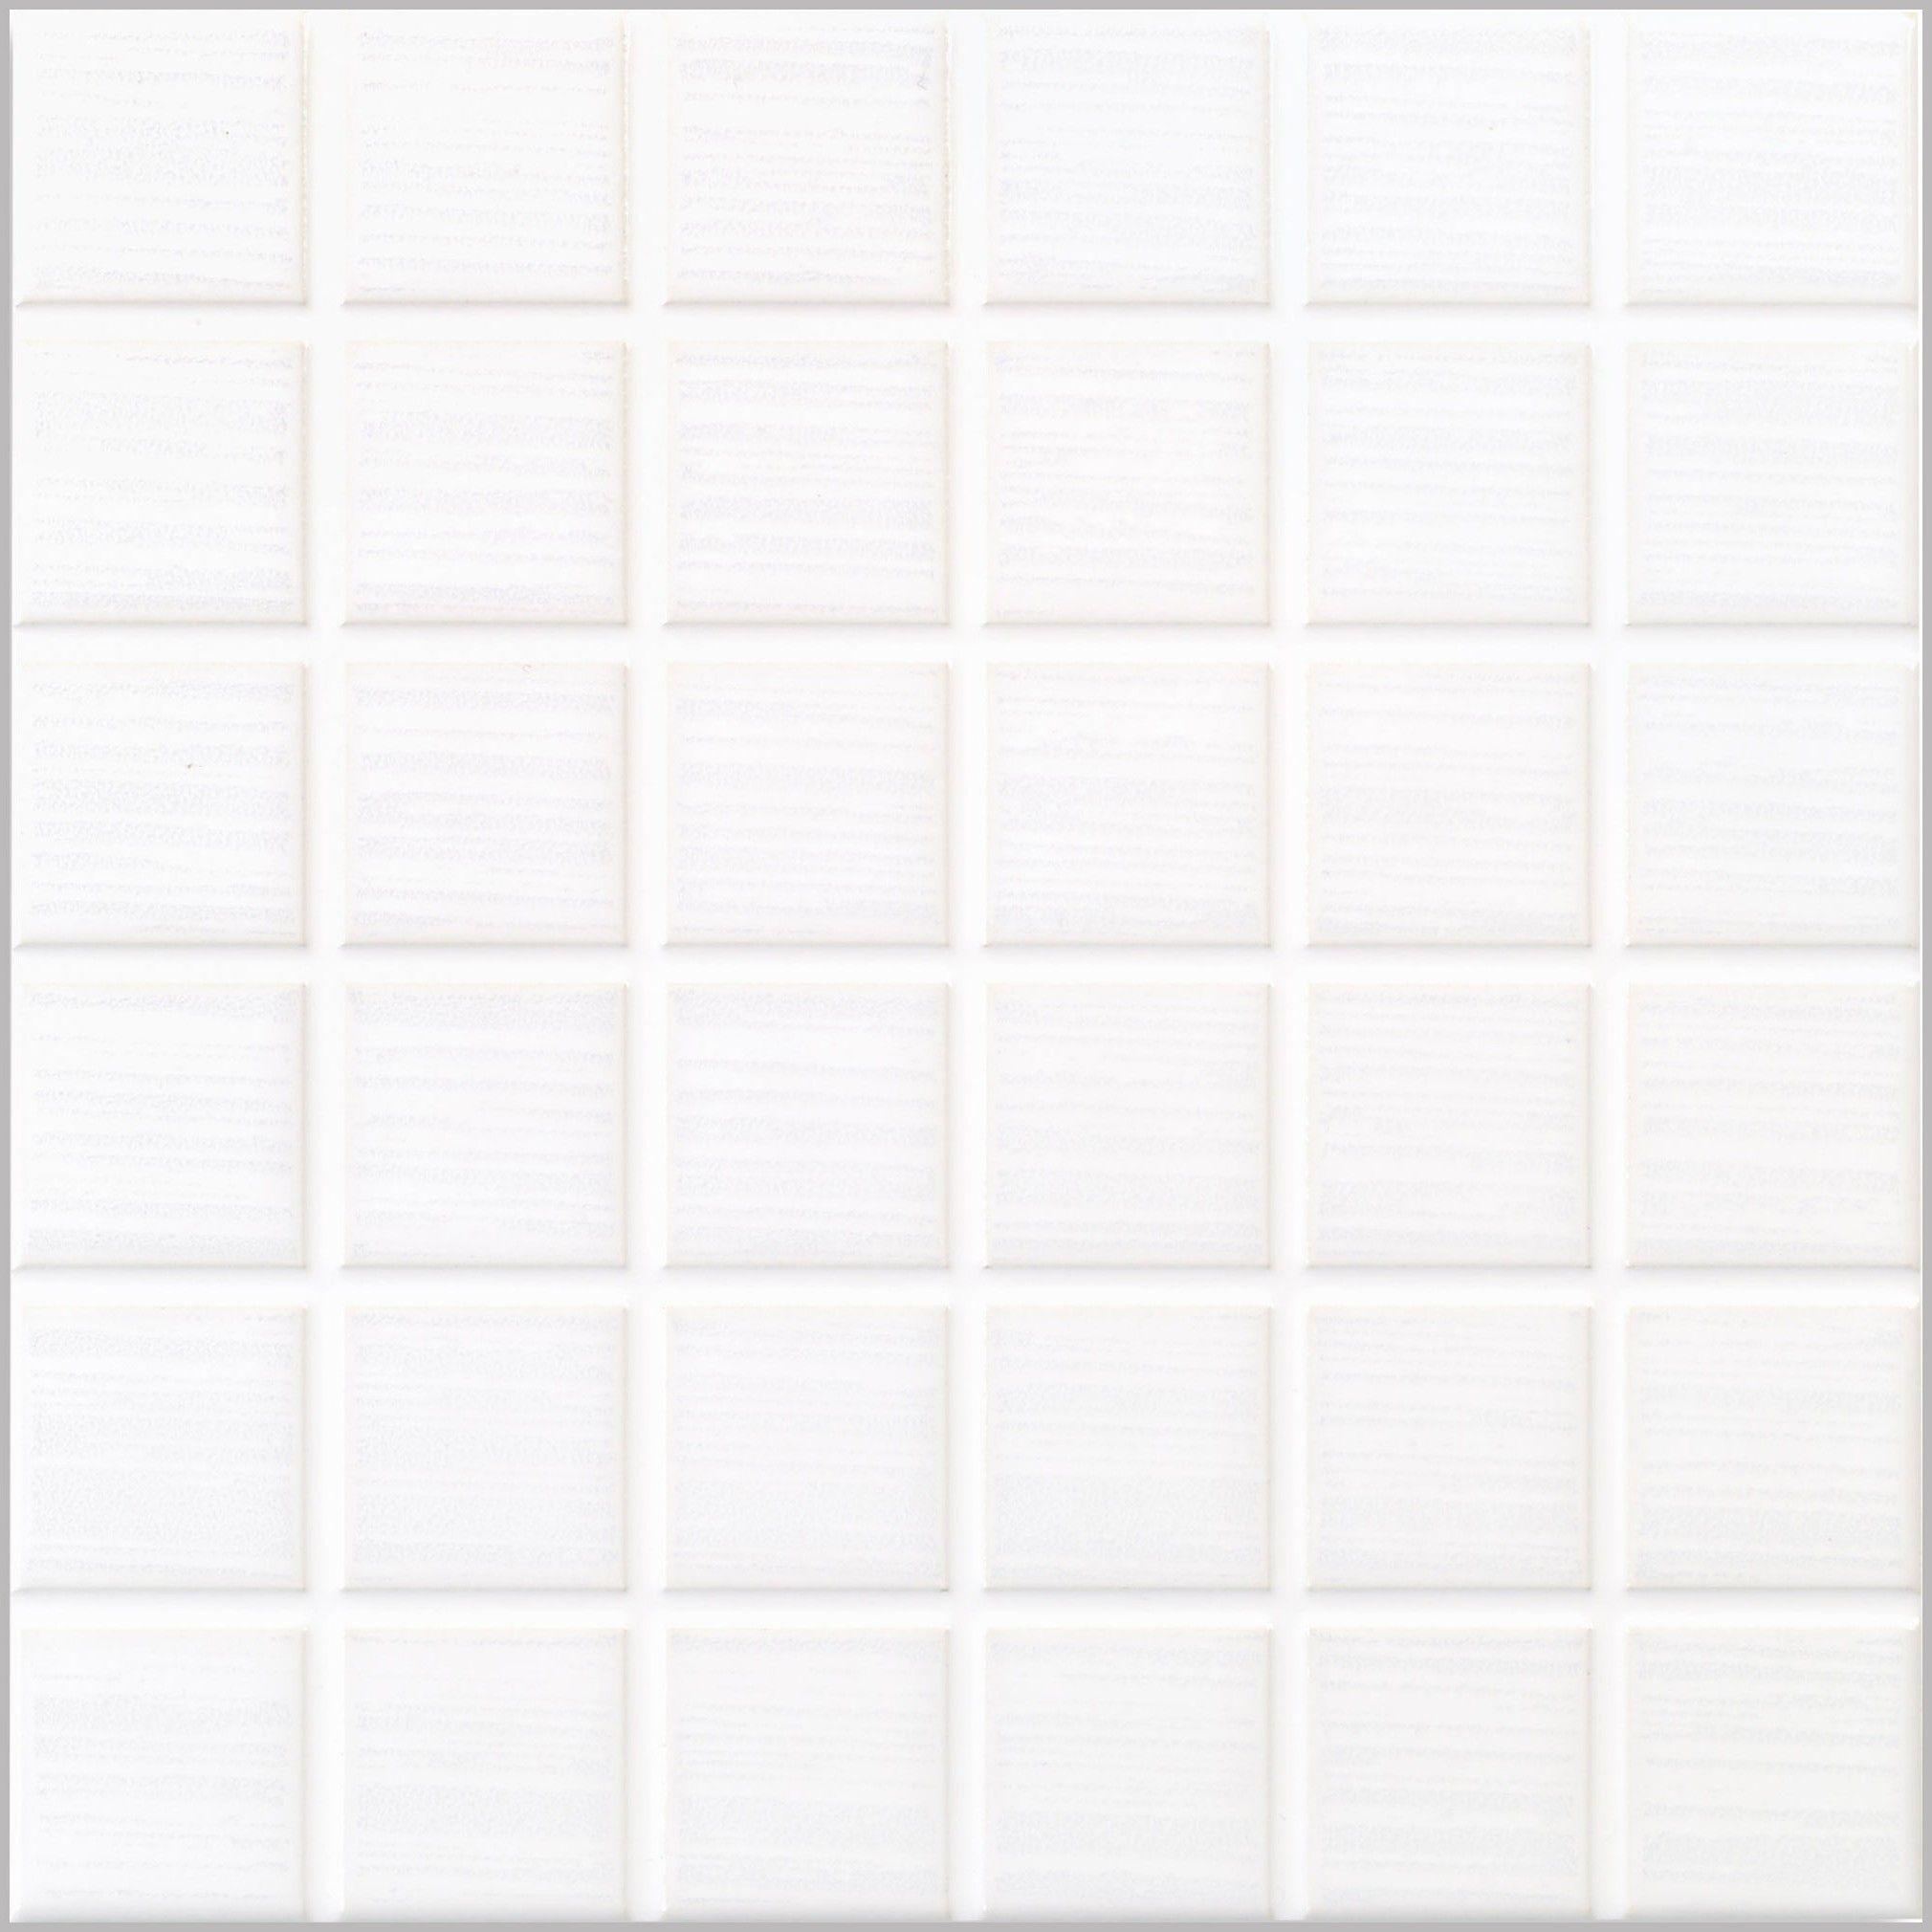 White Textured Bathroom Tiles | Bathroom Exclusiv | Pinterest ...